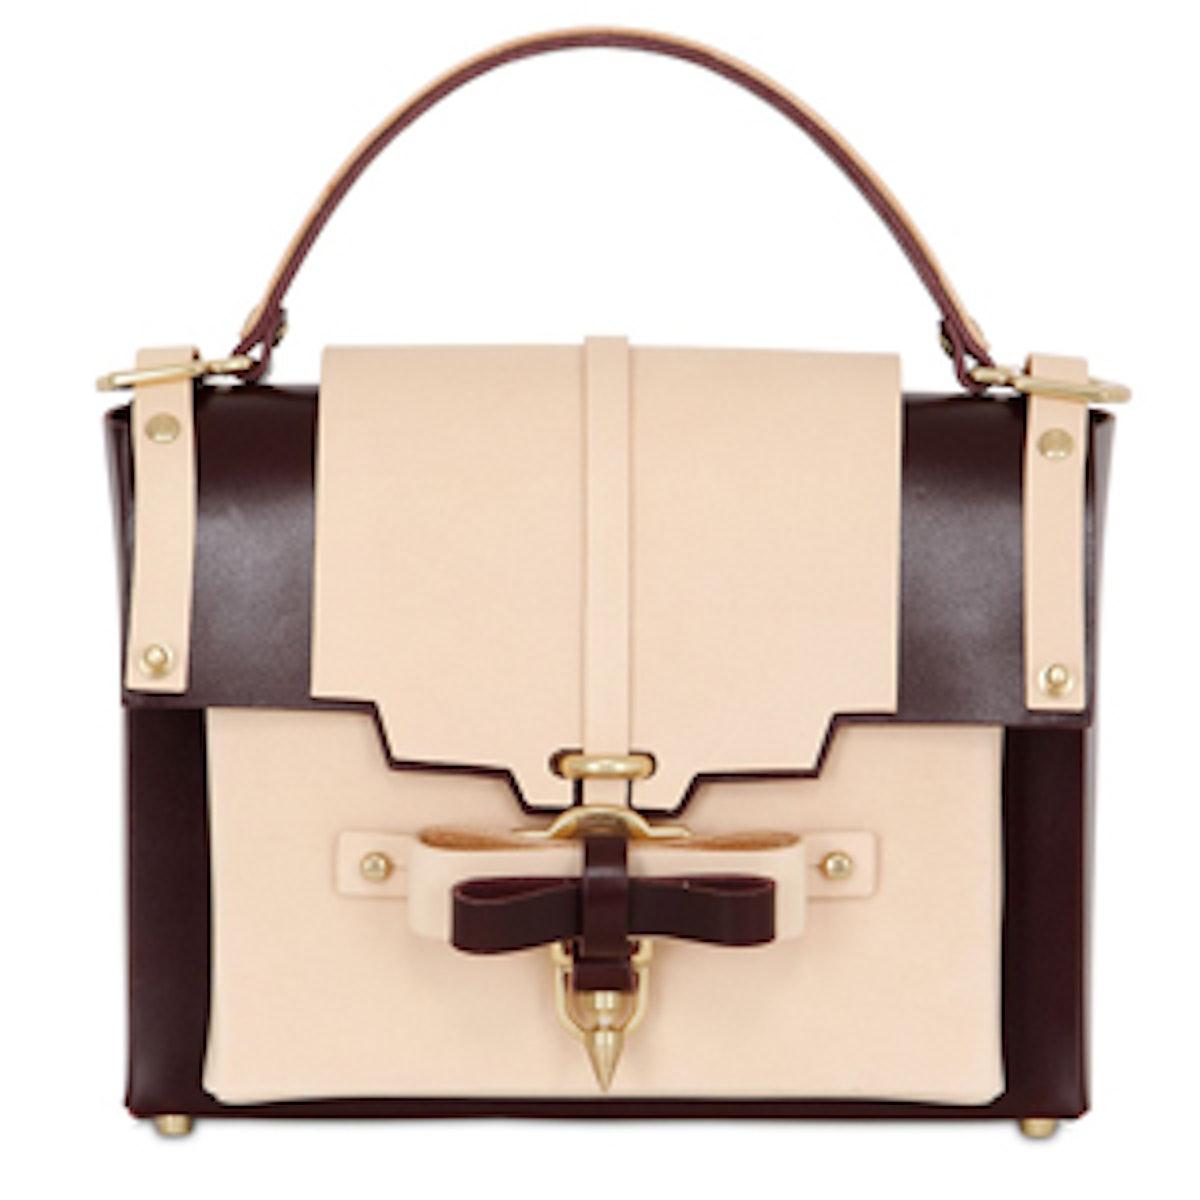 Bow Buckle Top-Handle Bag